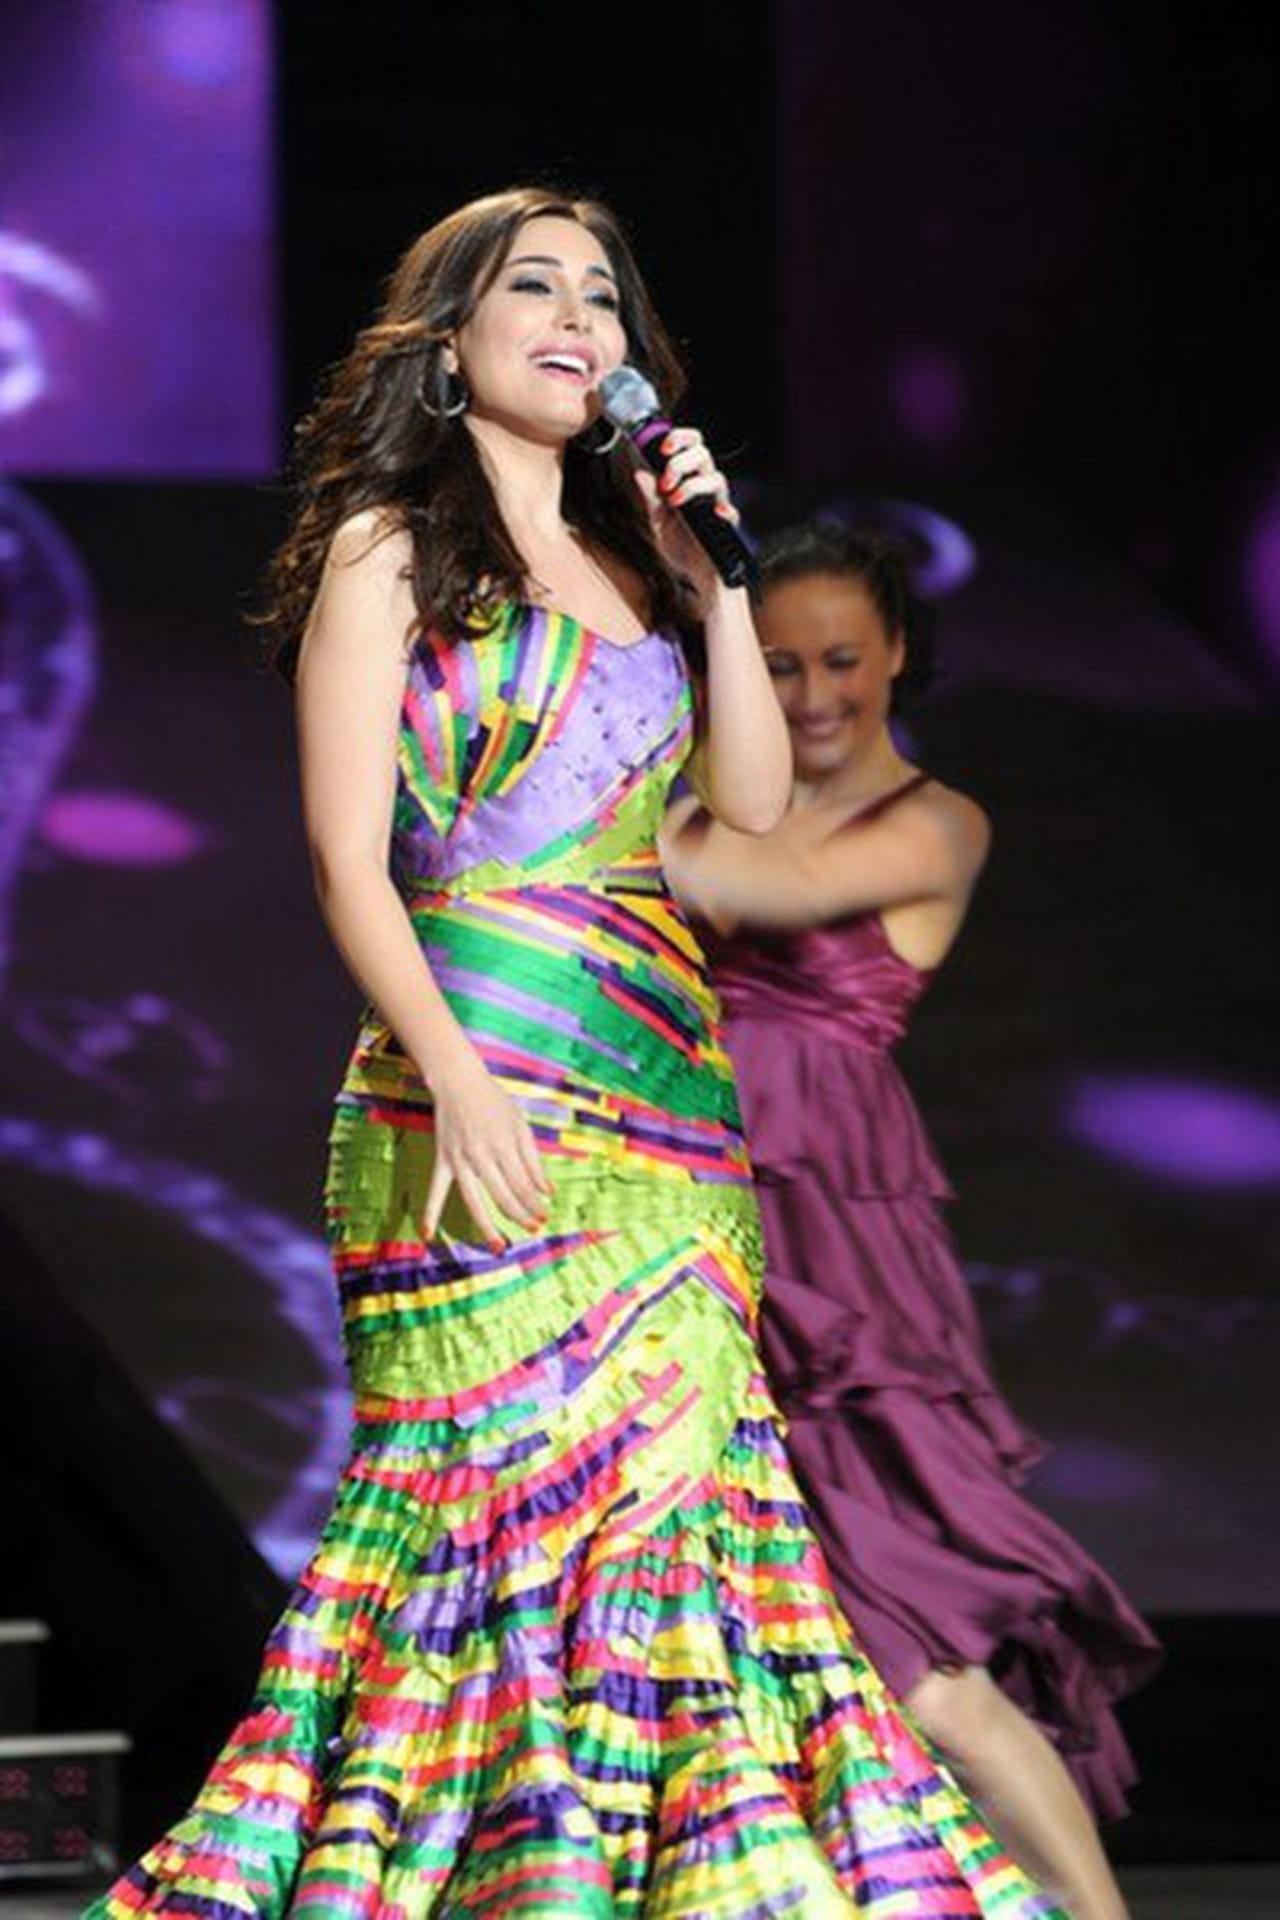 2a6d9a6709729 النجمة اللبنانية يارا تتألق في إحدى حفلاتها بفستان مُفعم بالألوان المتداخلة  من تصميم نيكولا جبران.